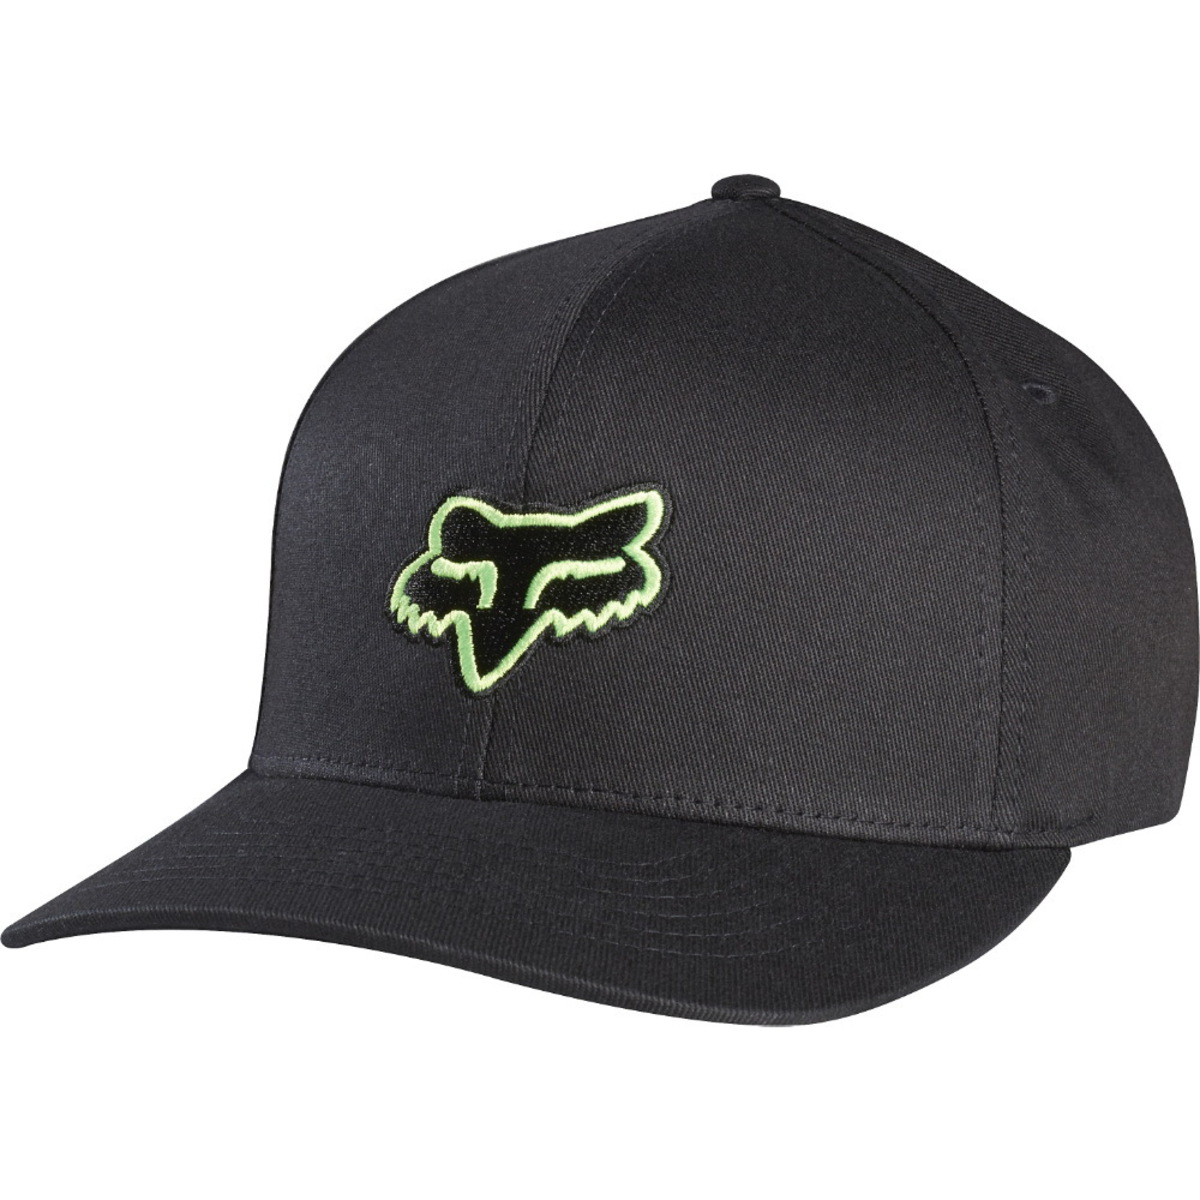 kšiltovka FOX - Legacy - Black/Green - 58225-151 XS/S